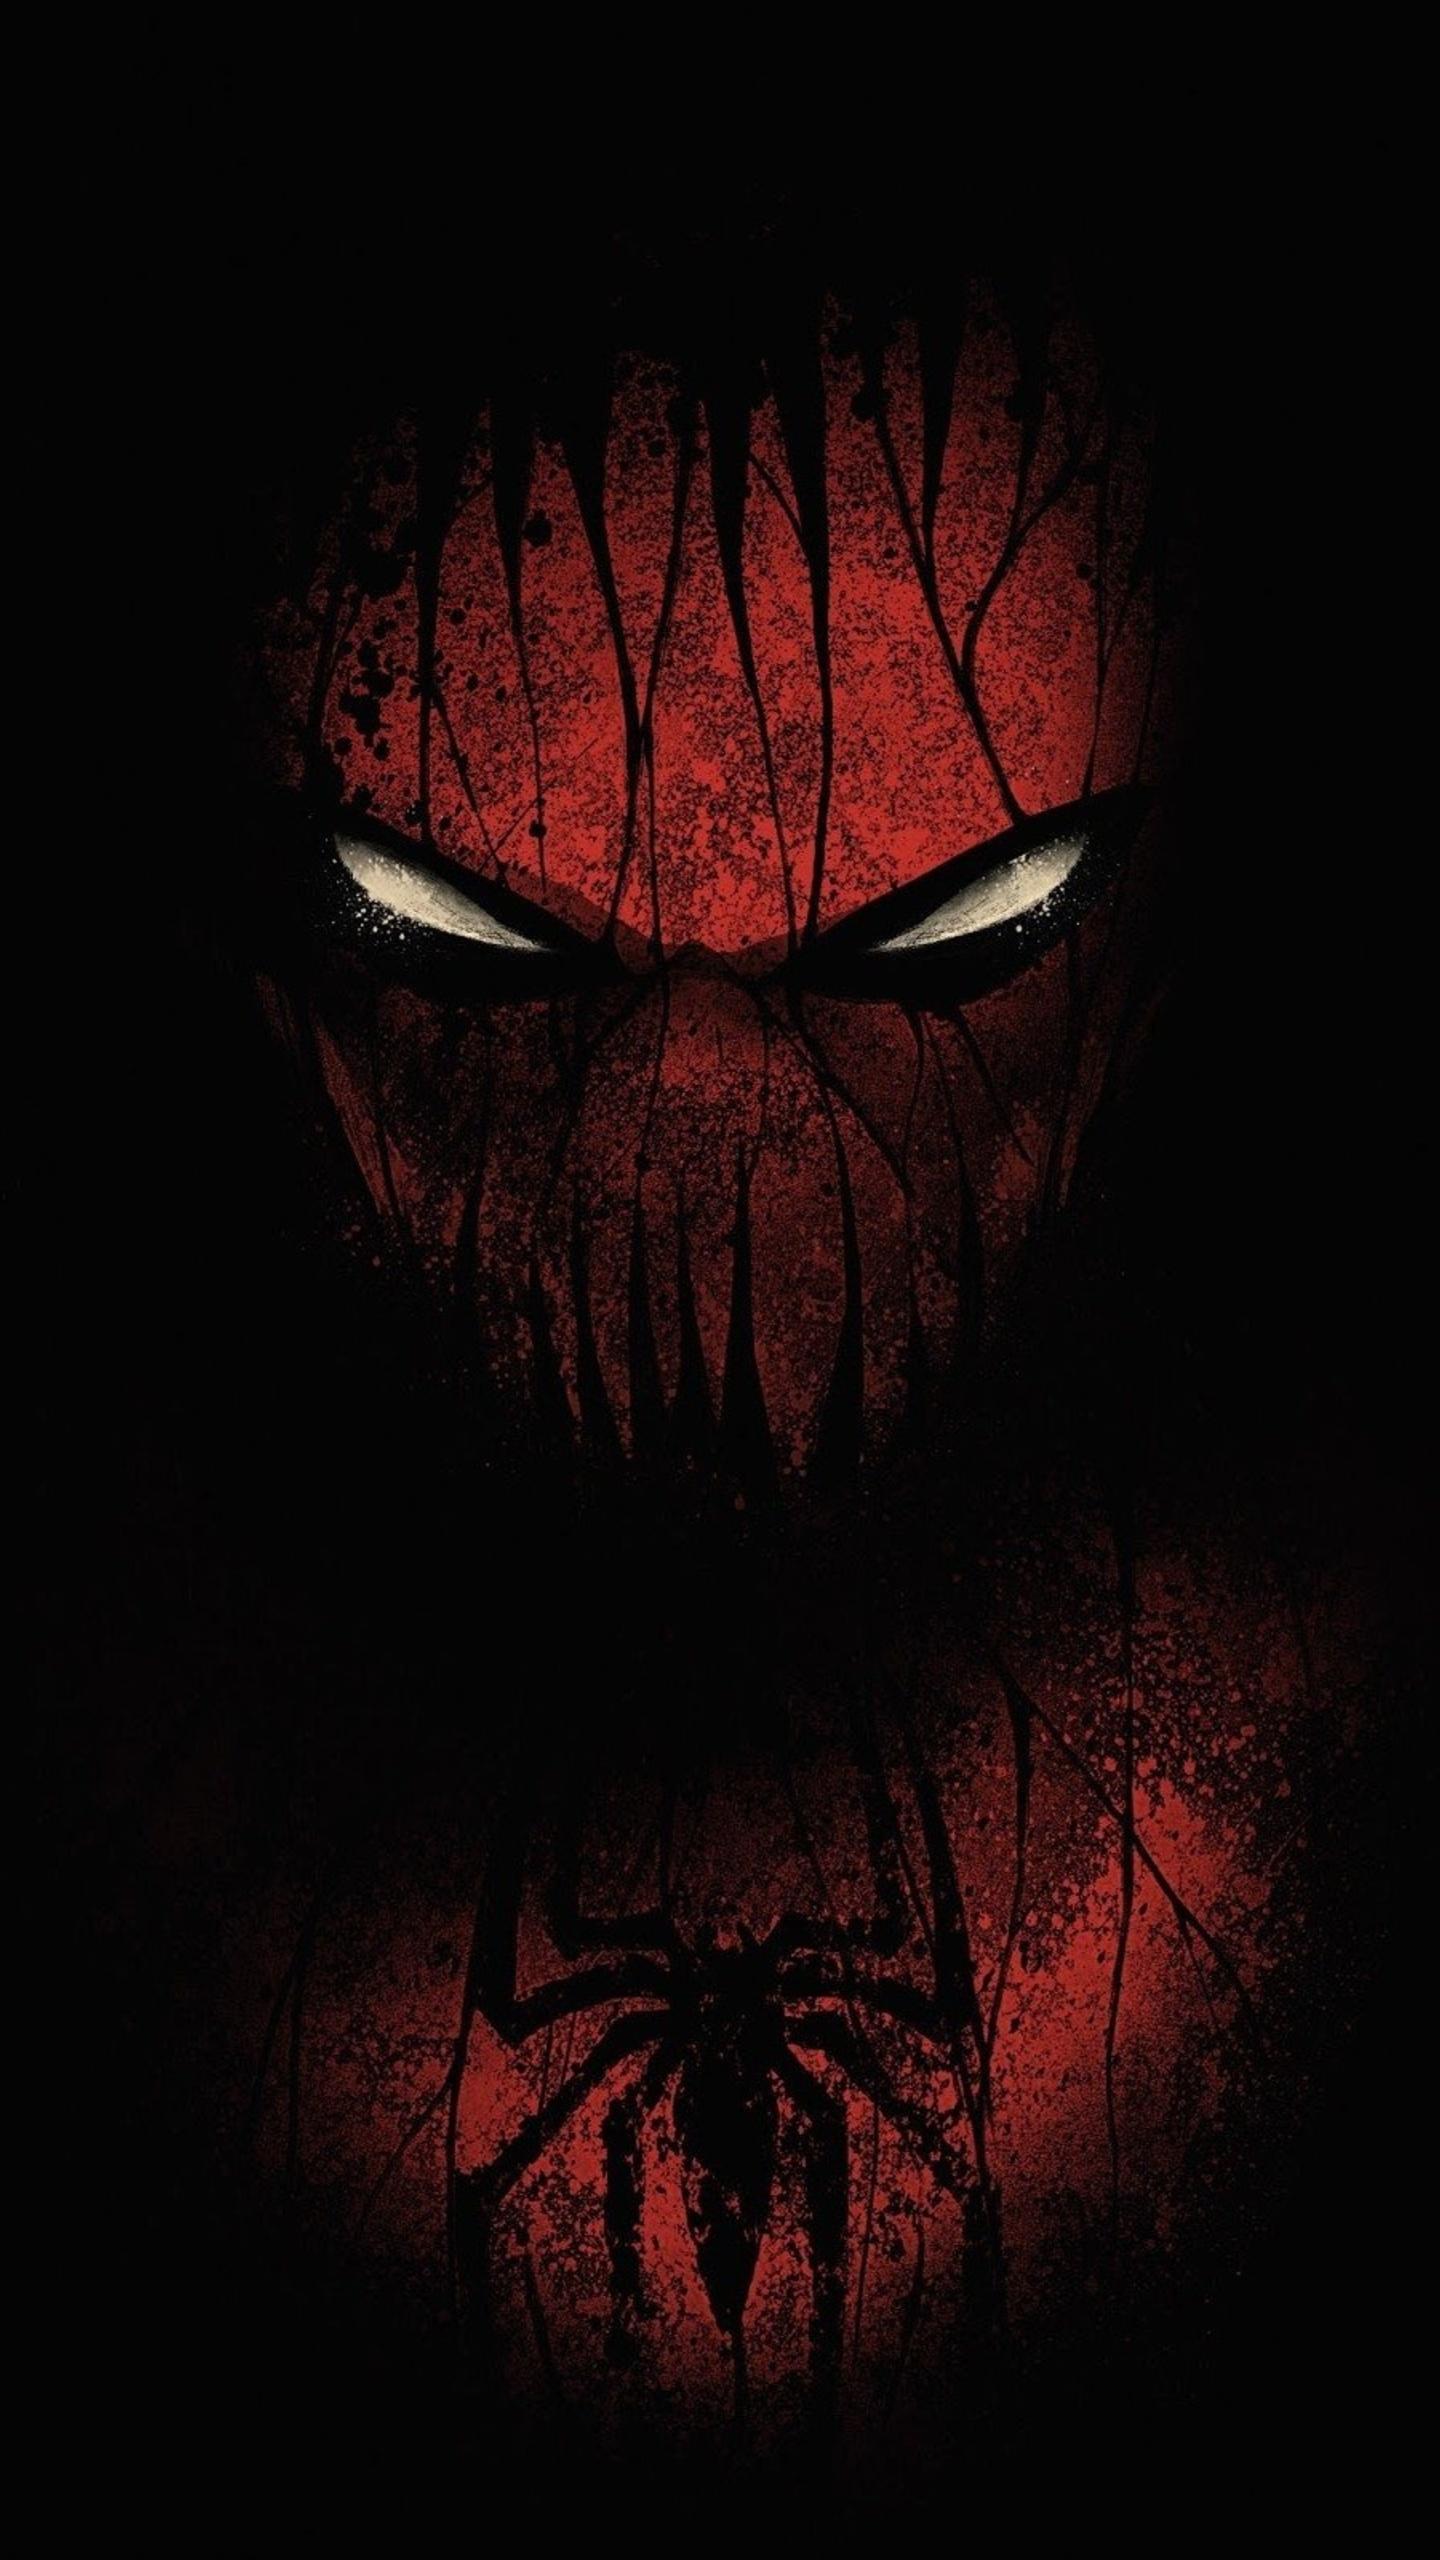 red-black-spiderman-jc.jpg